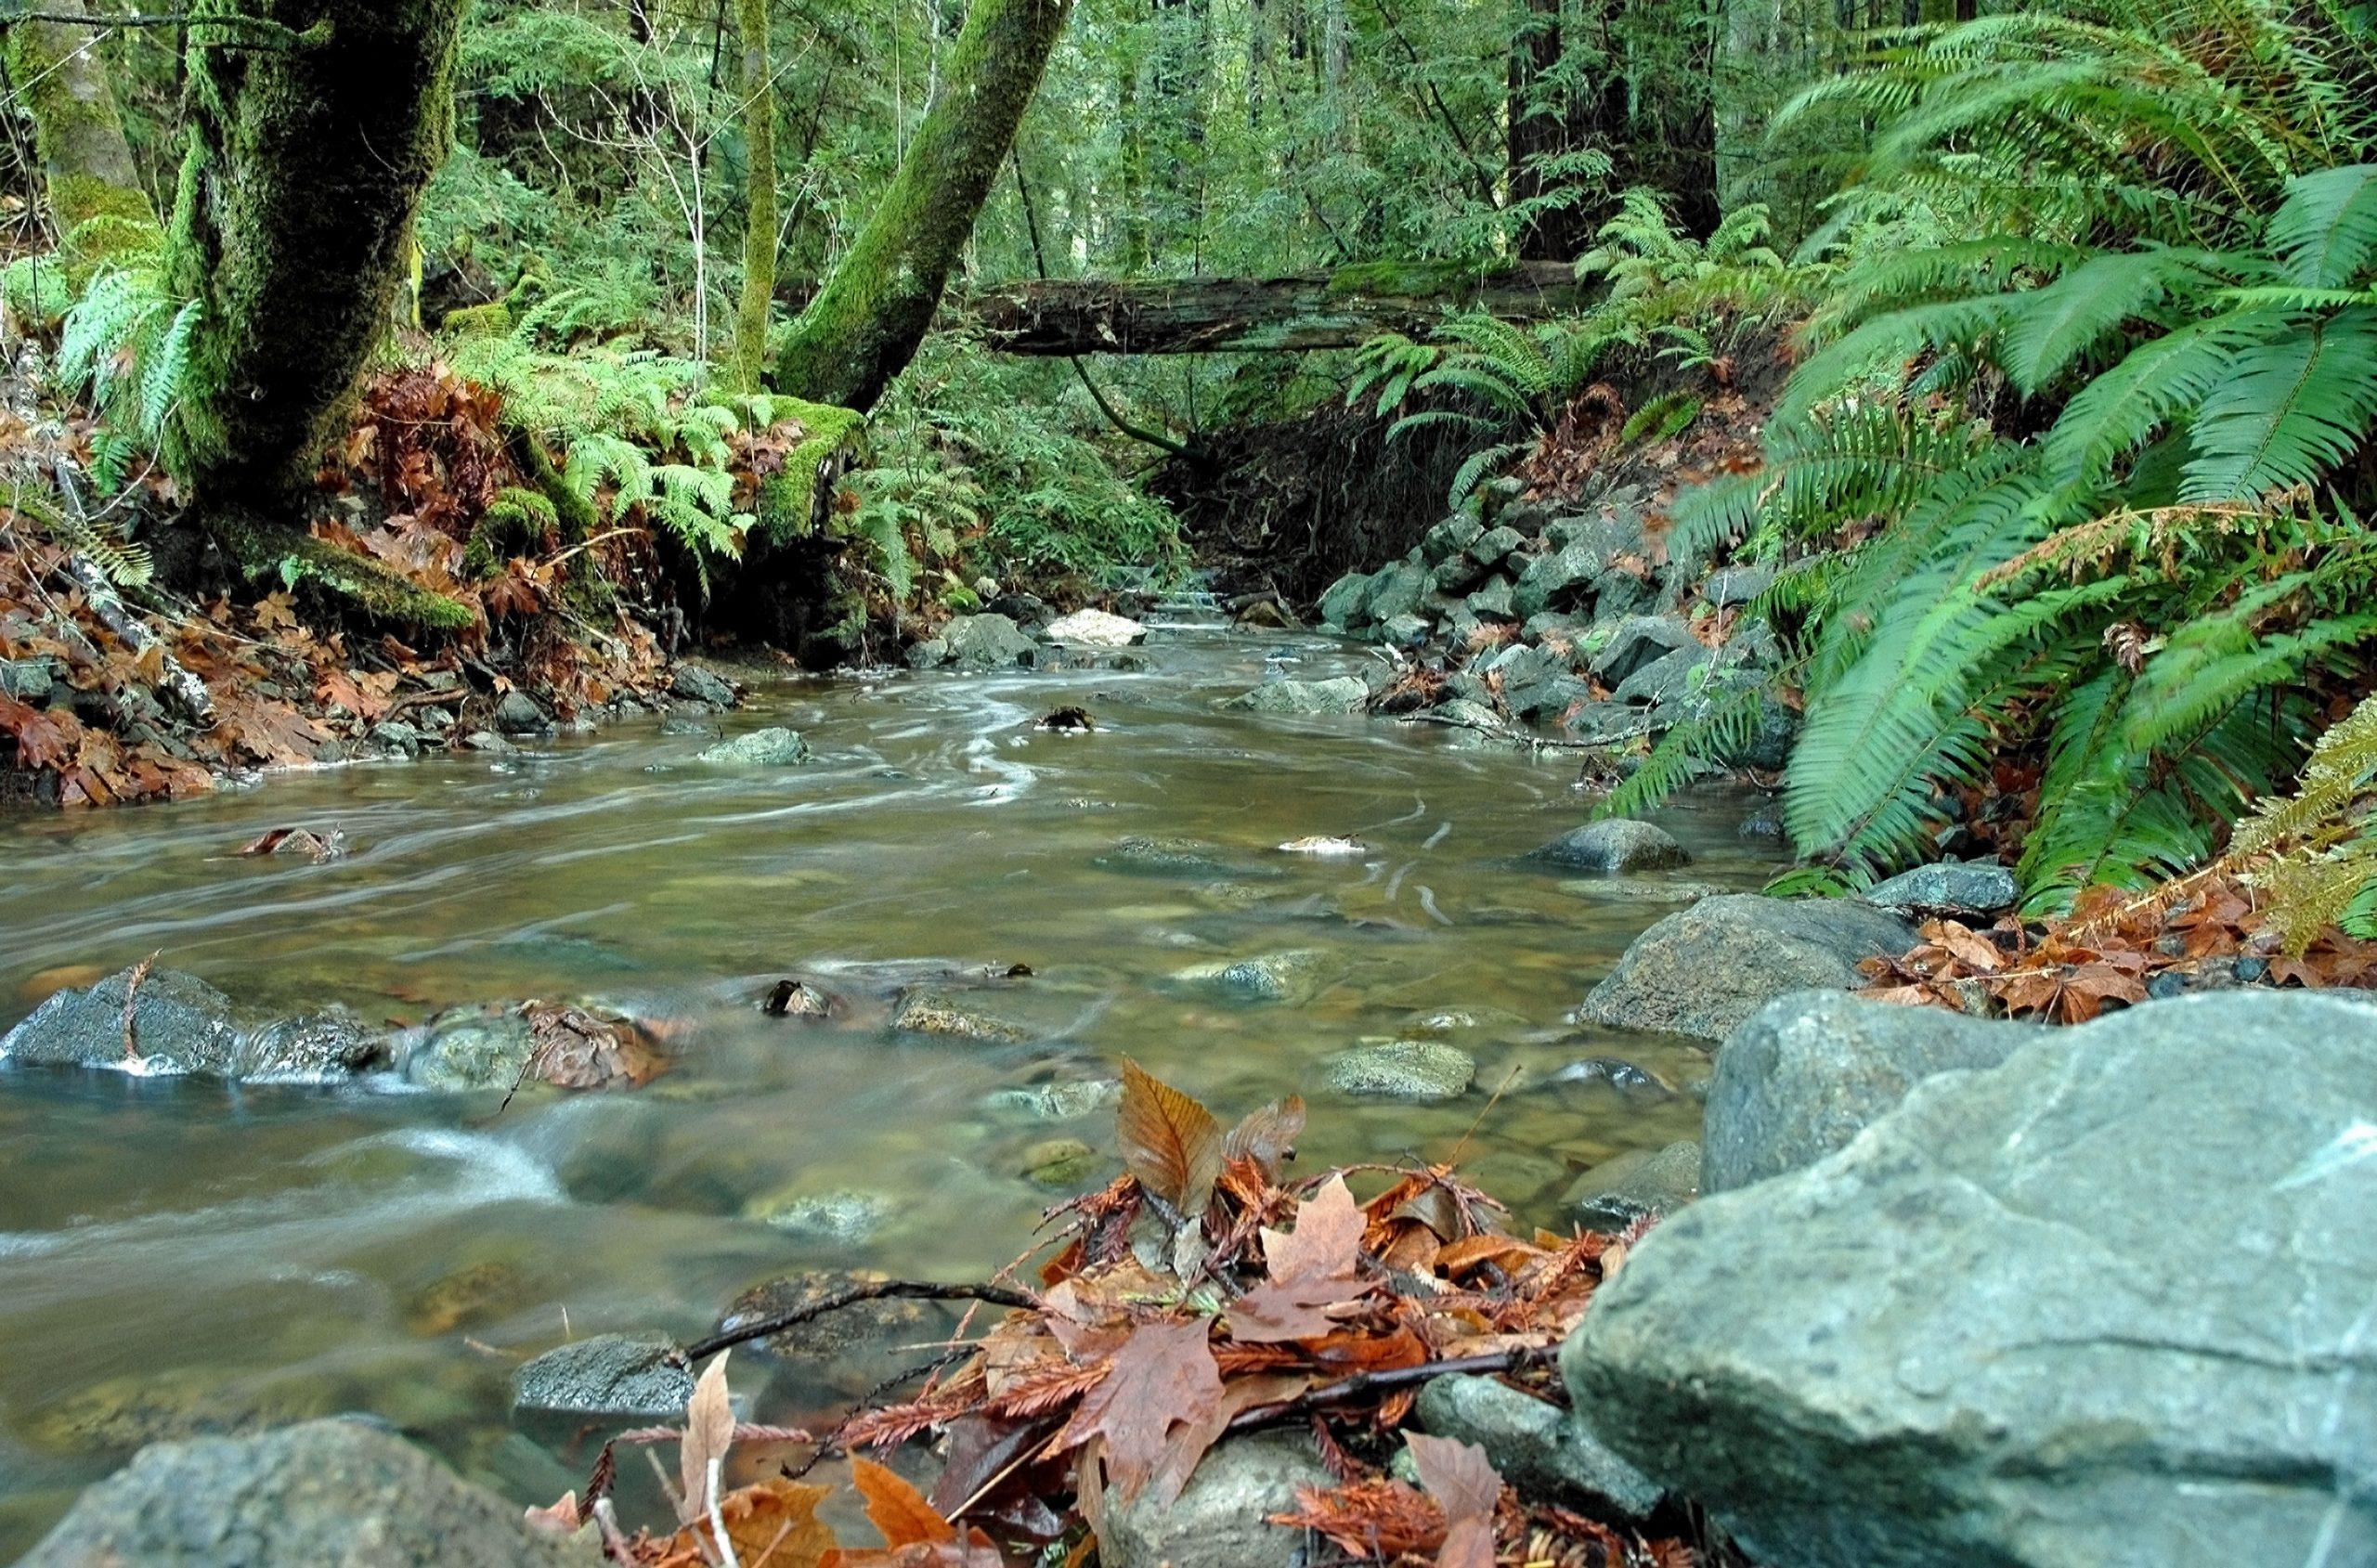 Creek Restoration and Permitting